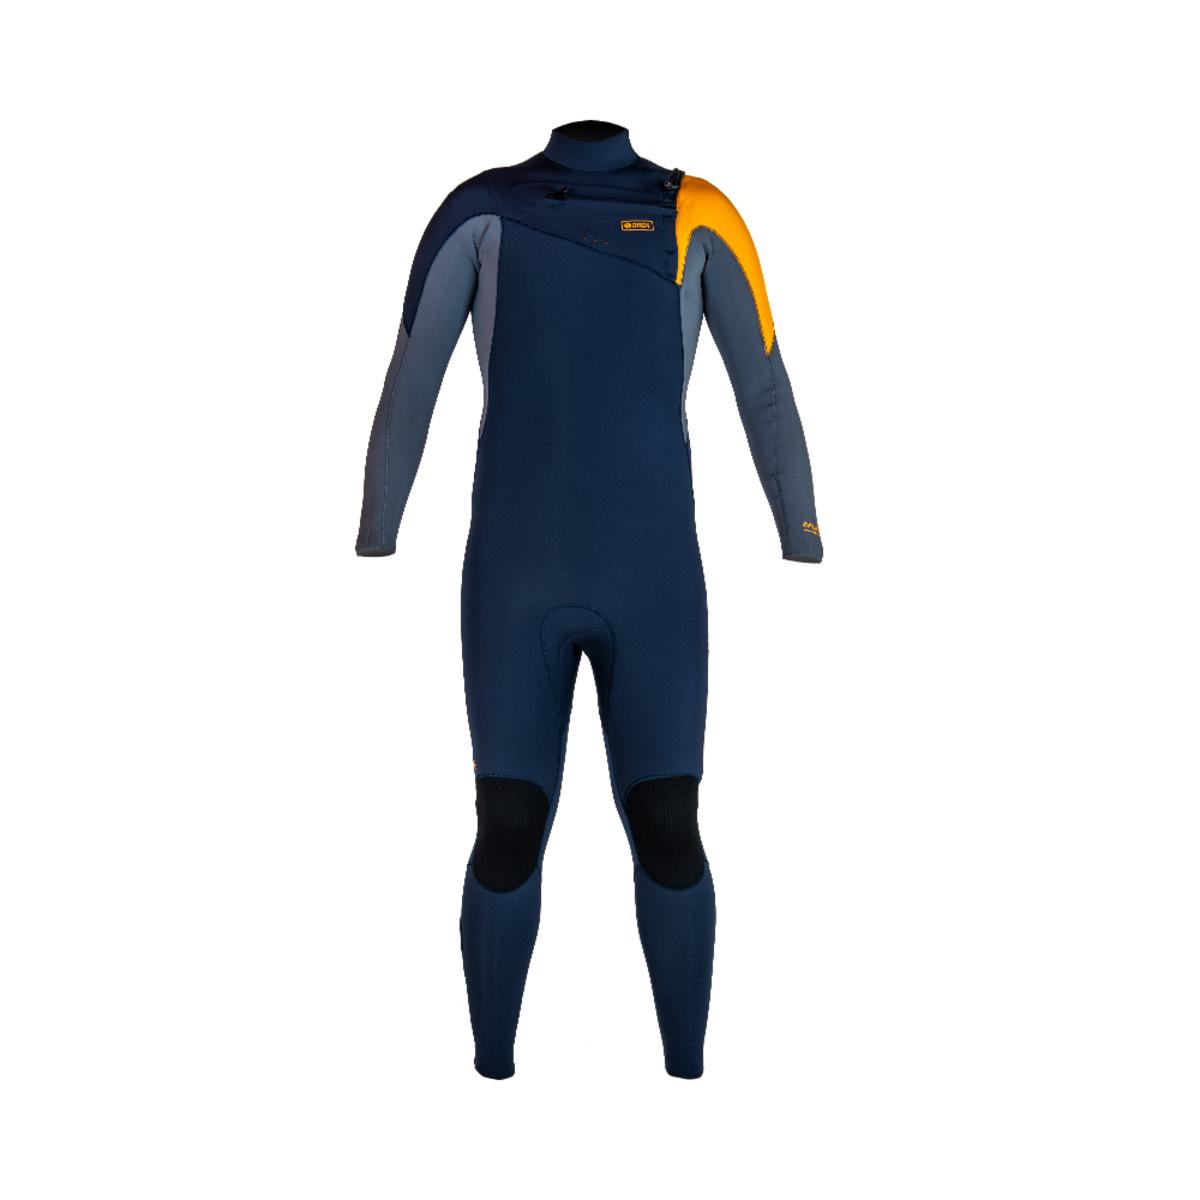 Onda SS21 Wetsuits